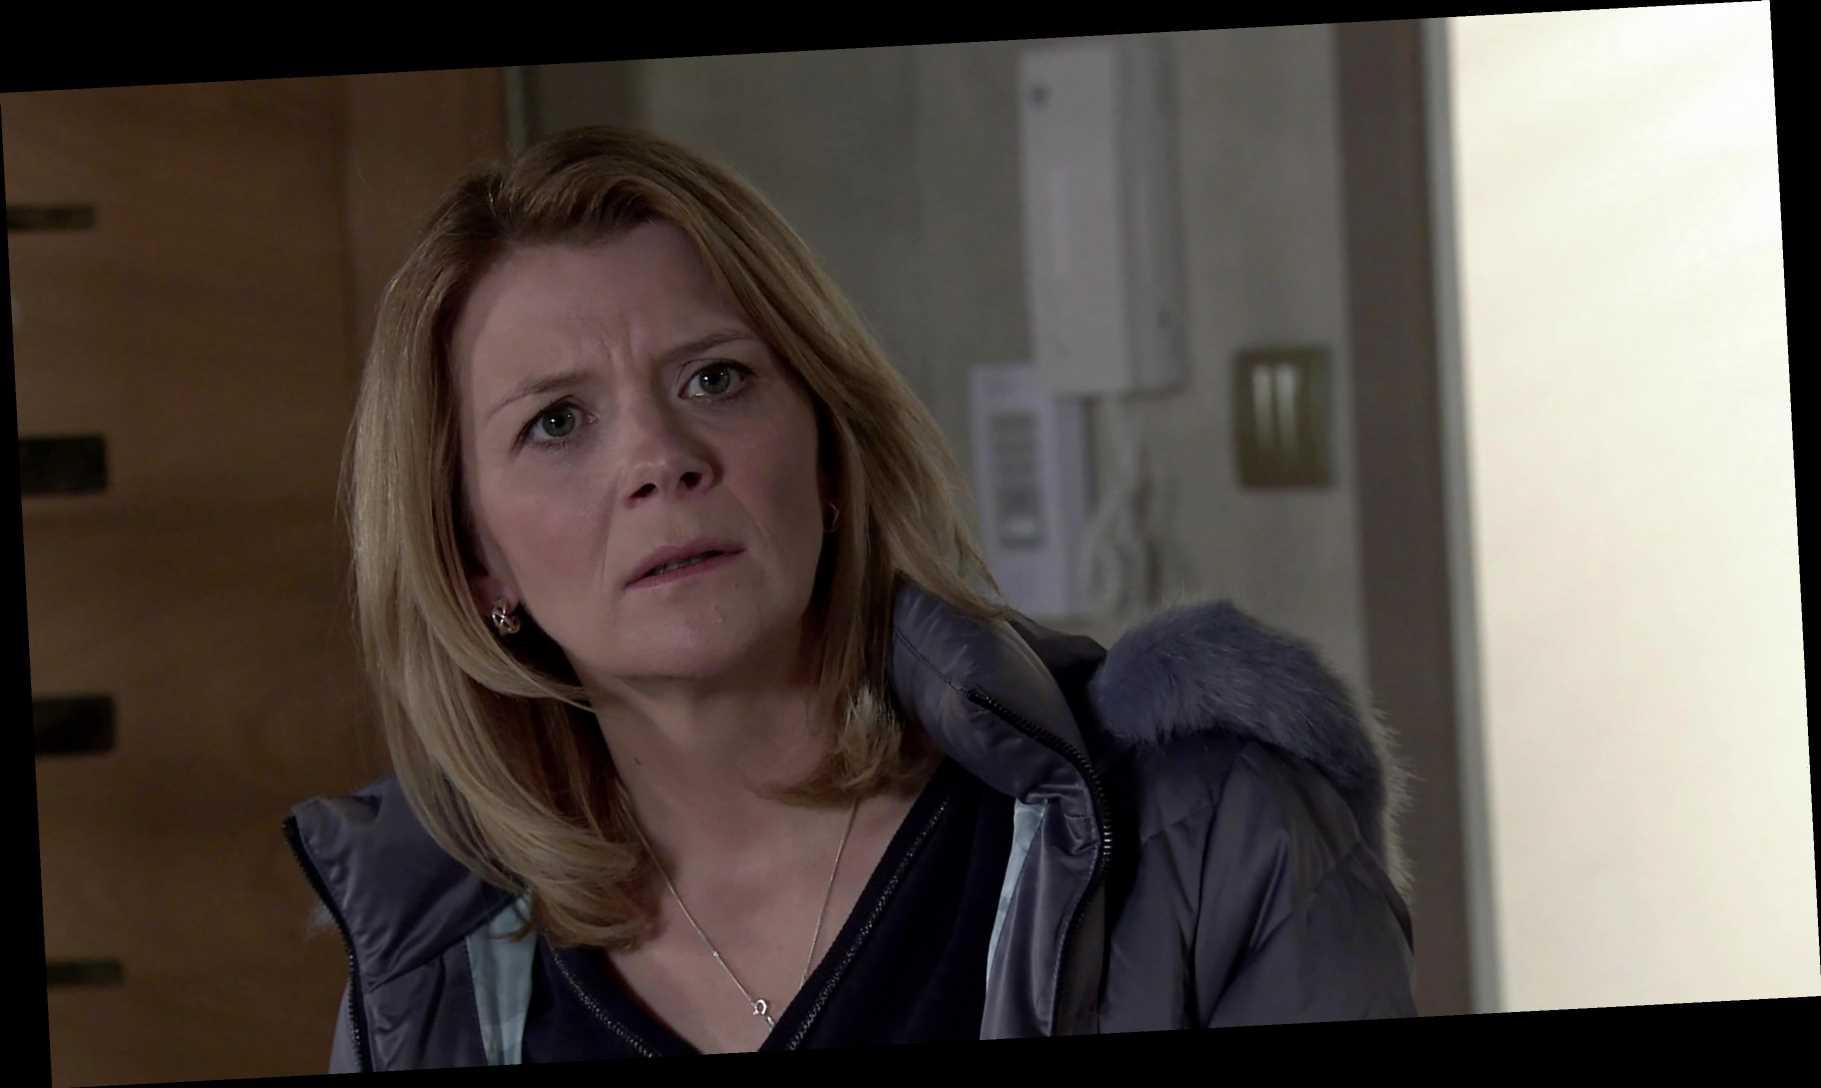 Seven Coronation Street spoilers for next week including Leanne Battersby fleeing Weatherfield's drugs gang